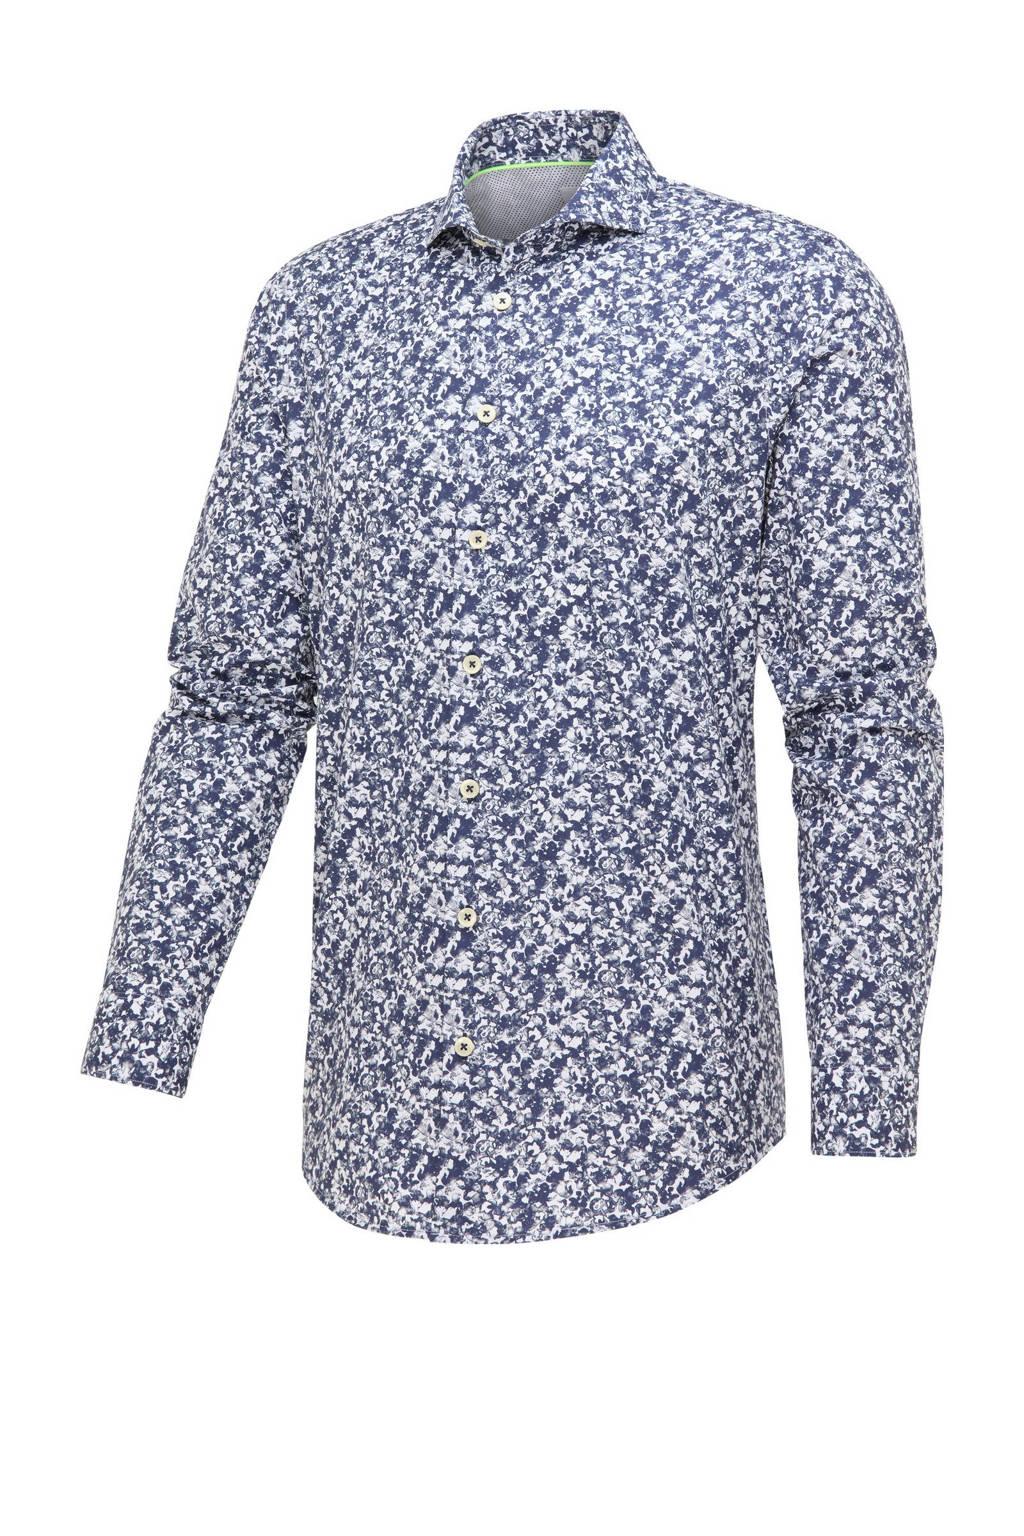 Blue Industry slim fit overhemd met all over print blauw, Blauw